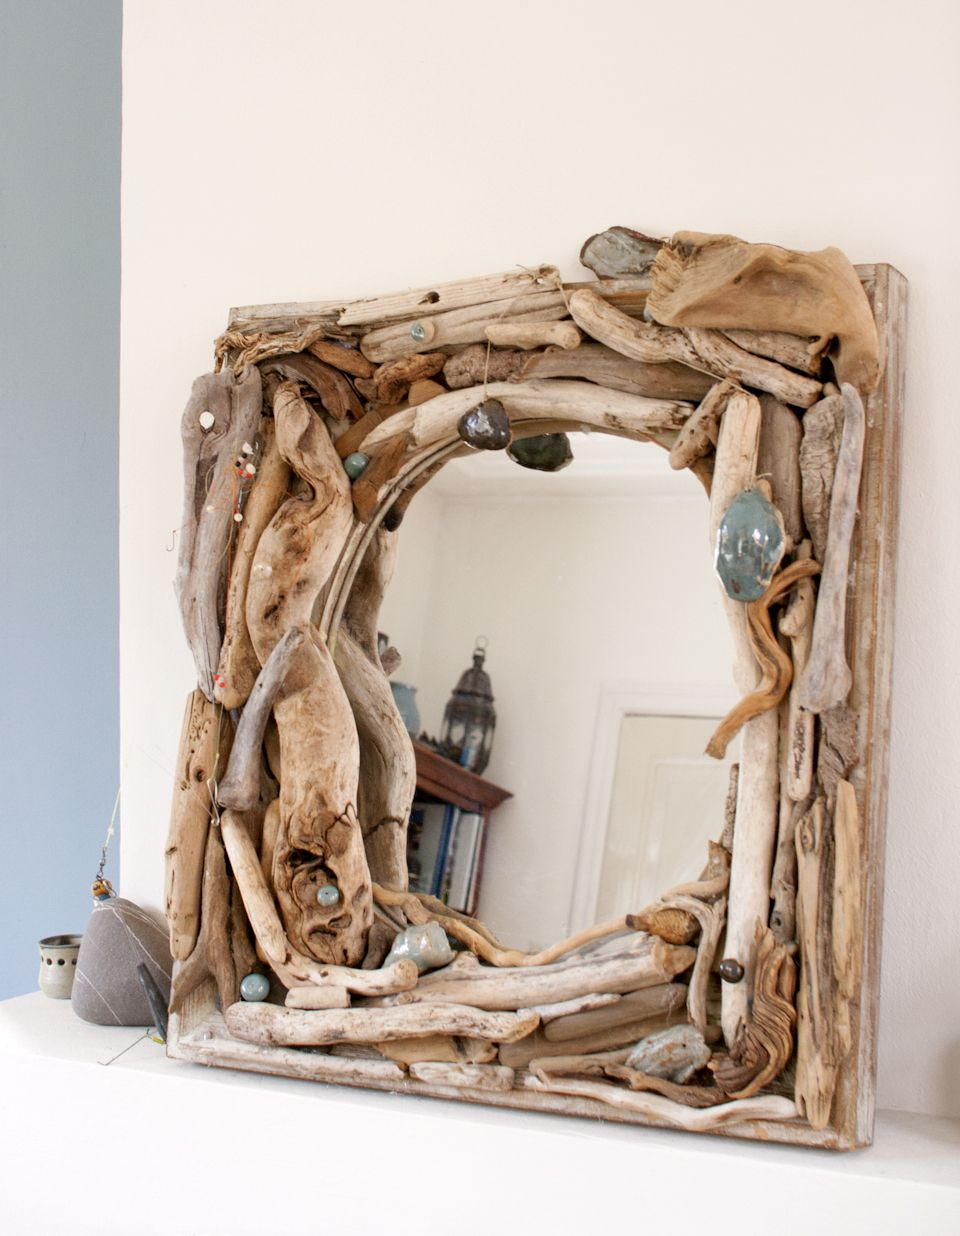 Mirror driftwood ceramics spiegel hout keramiek sia windig mirror driftwood ceramics spiegel hout keramiek sia windig jeuxipadfo Images